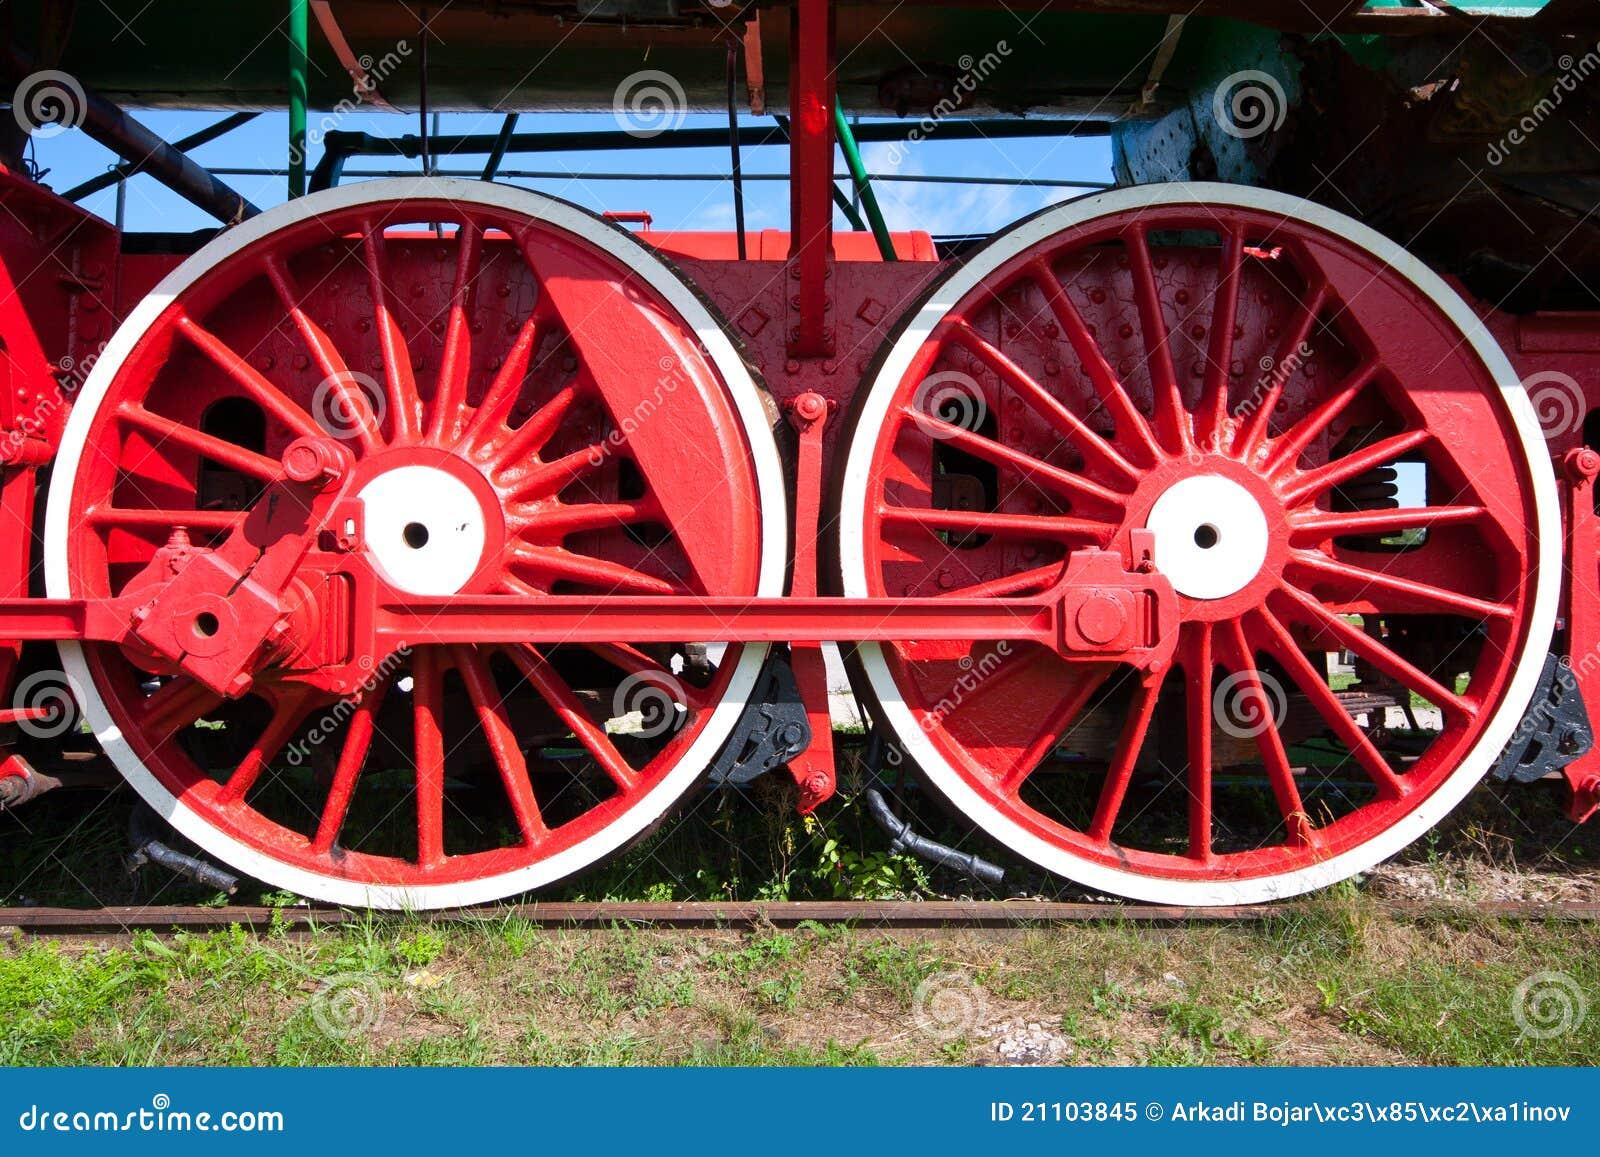 Train Wheels Royalty Free Stock Photo - Image: 21103845